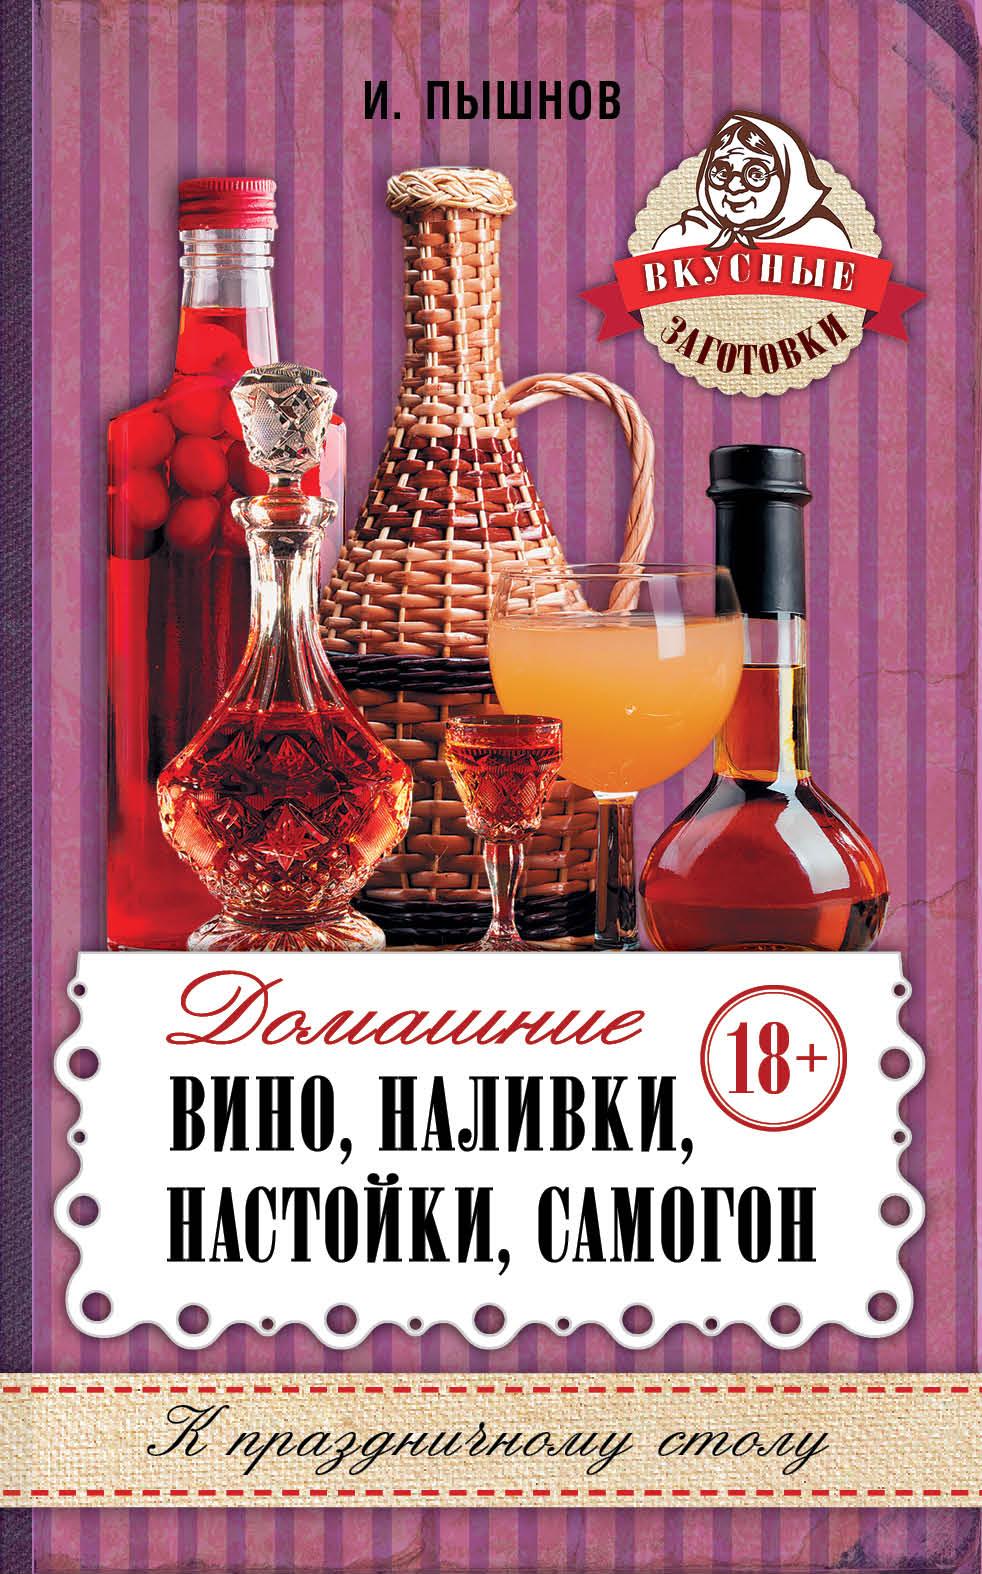 Домашнее вино, наливки, настойки, самогон ( Пышнов И.Г.  )